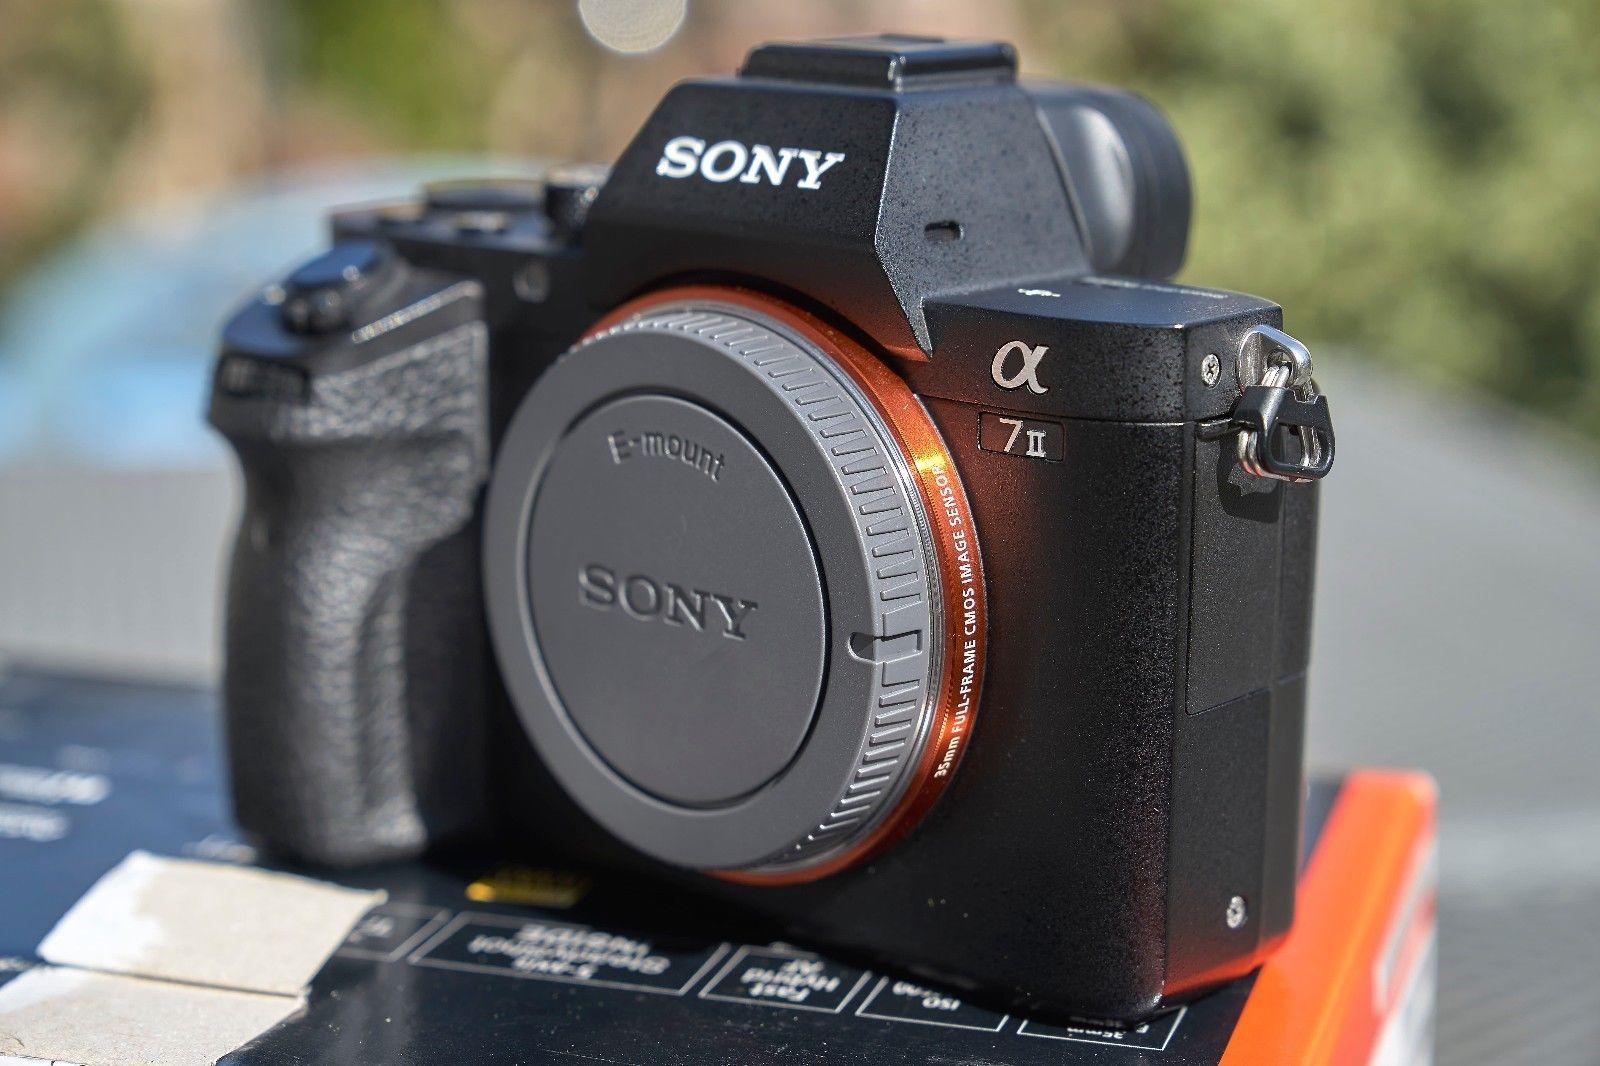 Sony Alpha ILCE-7M2 A7 II - E-Mount Vollformat Digitalkamera (24,3 Megapixel)